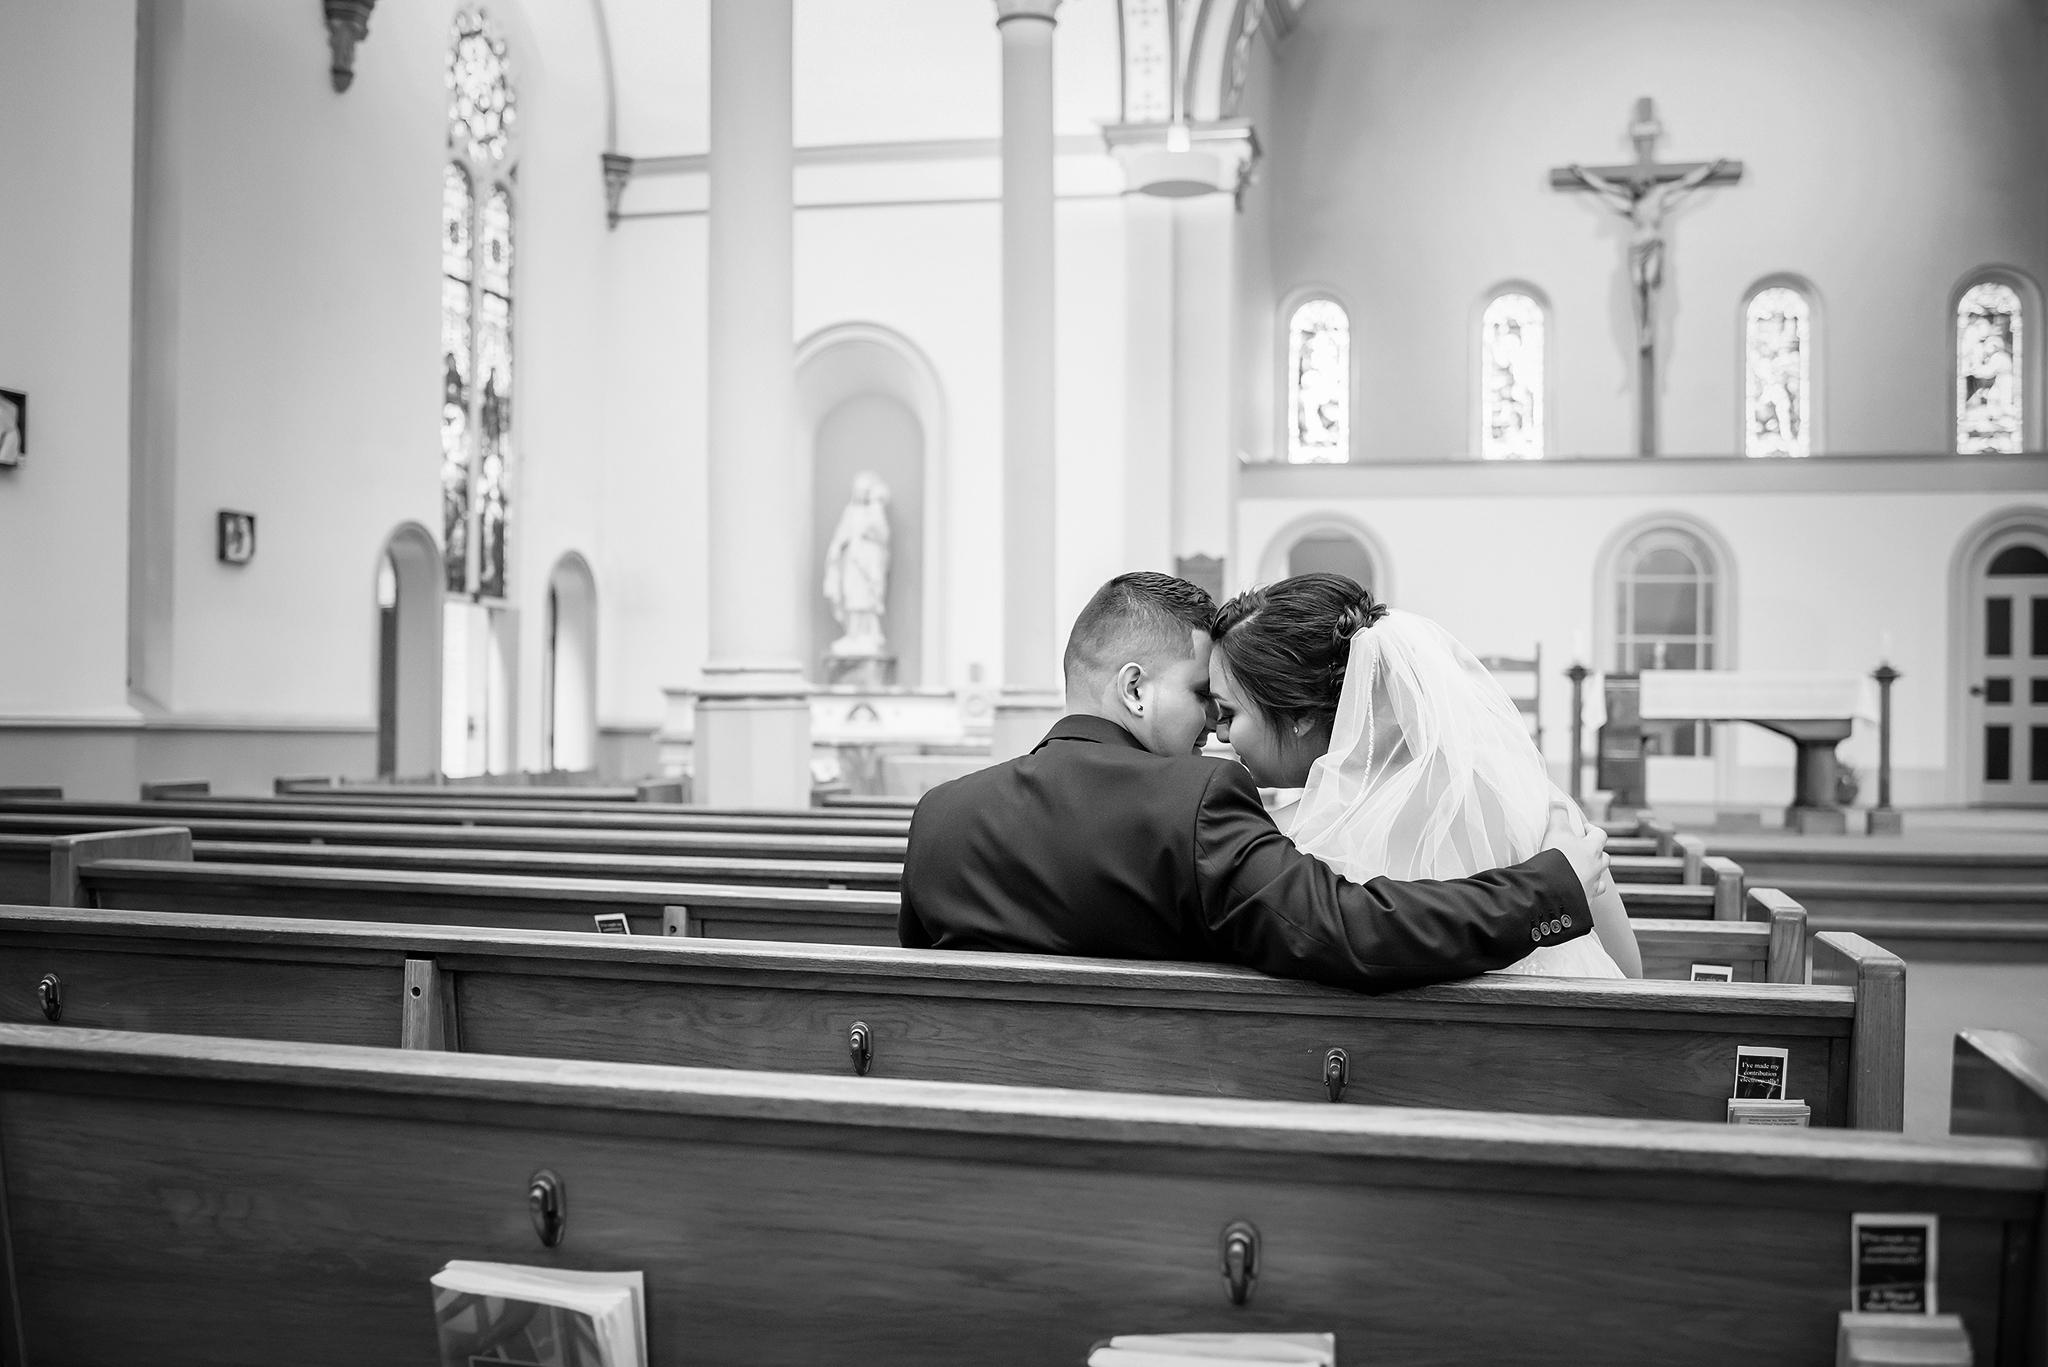 Lindsay-Adkins-Photography-Michigan-Wedding-Photographer-BernalBlog-8